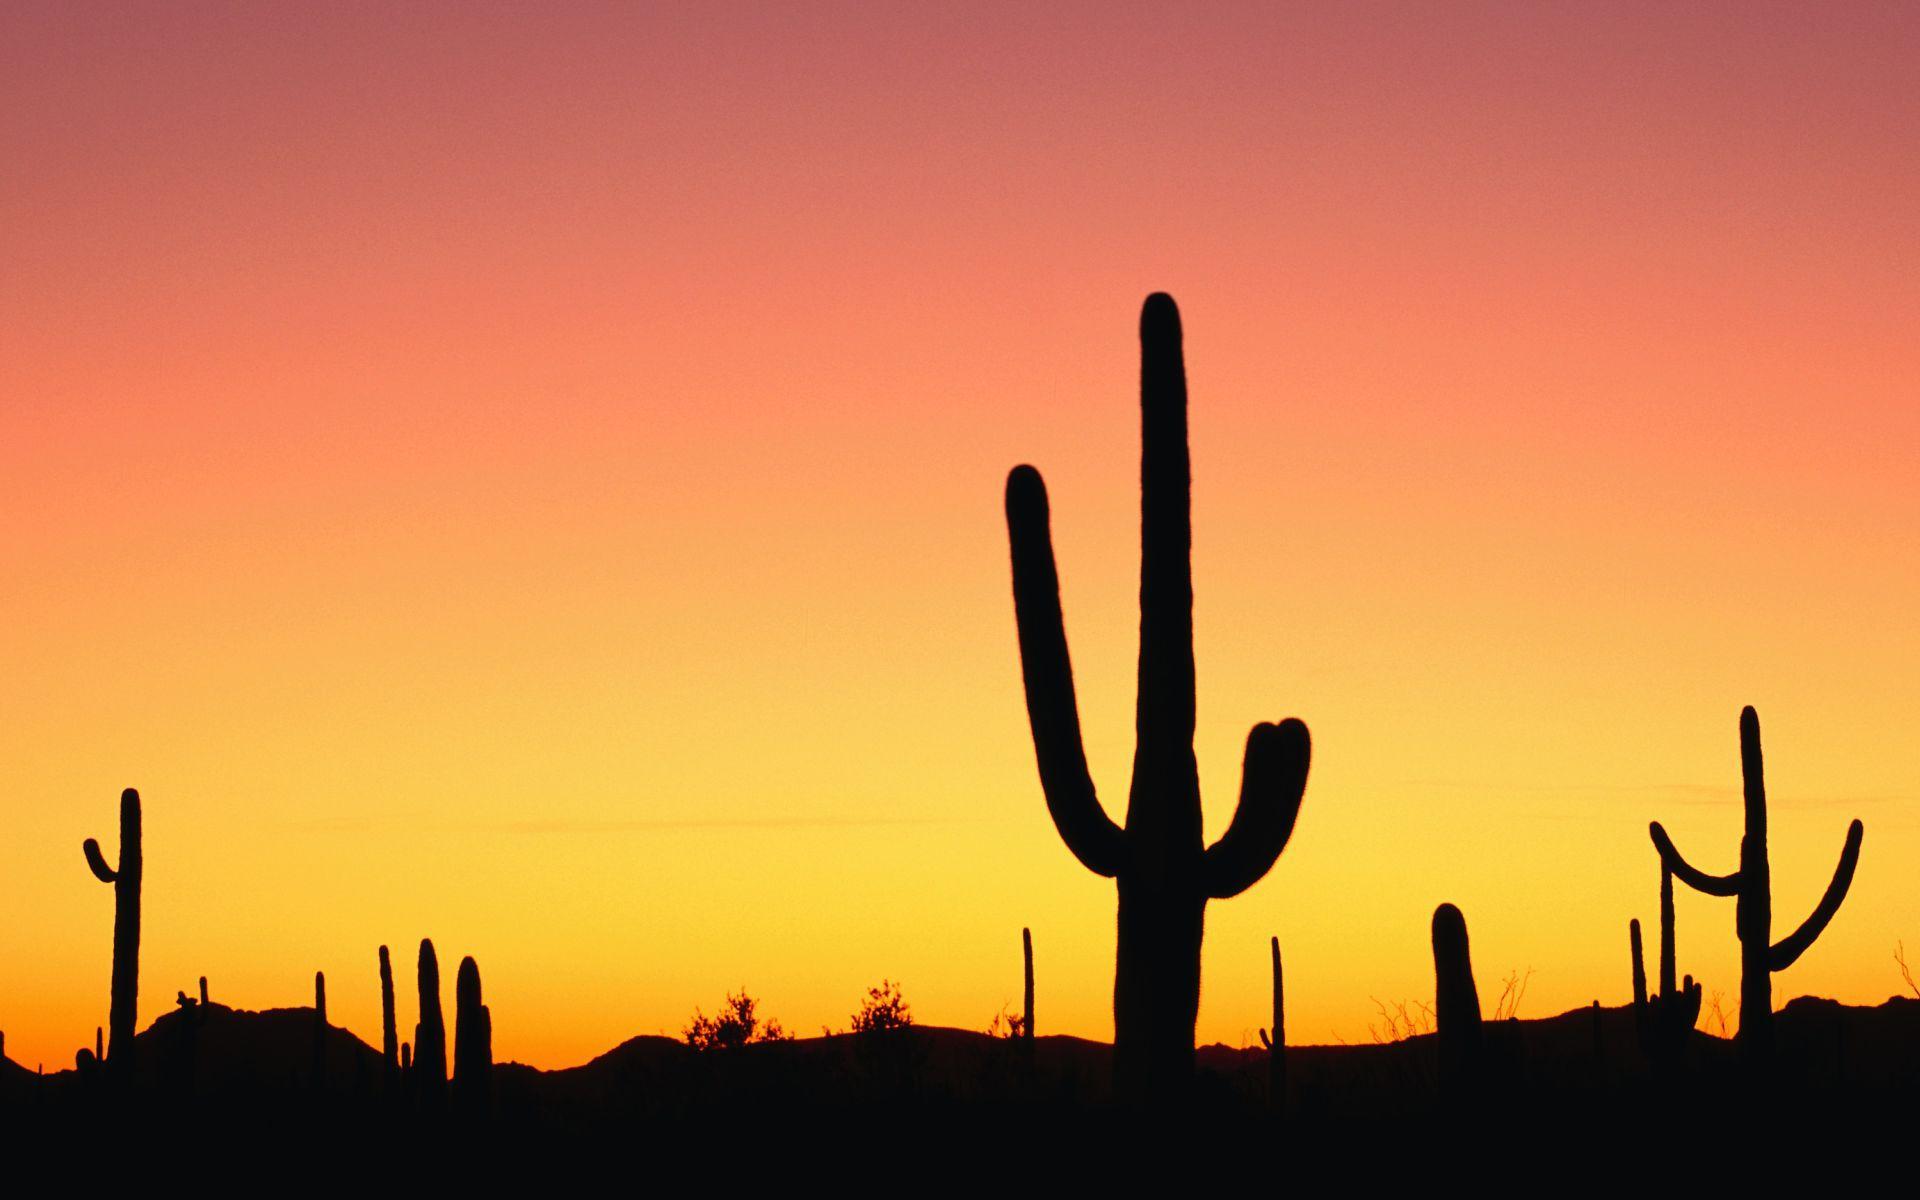 desert wallpaper cactus hd - photo #10